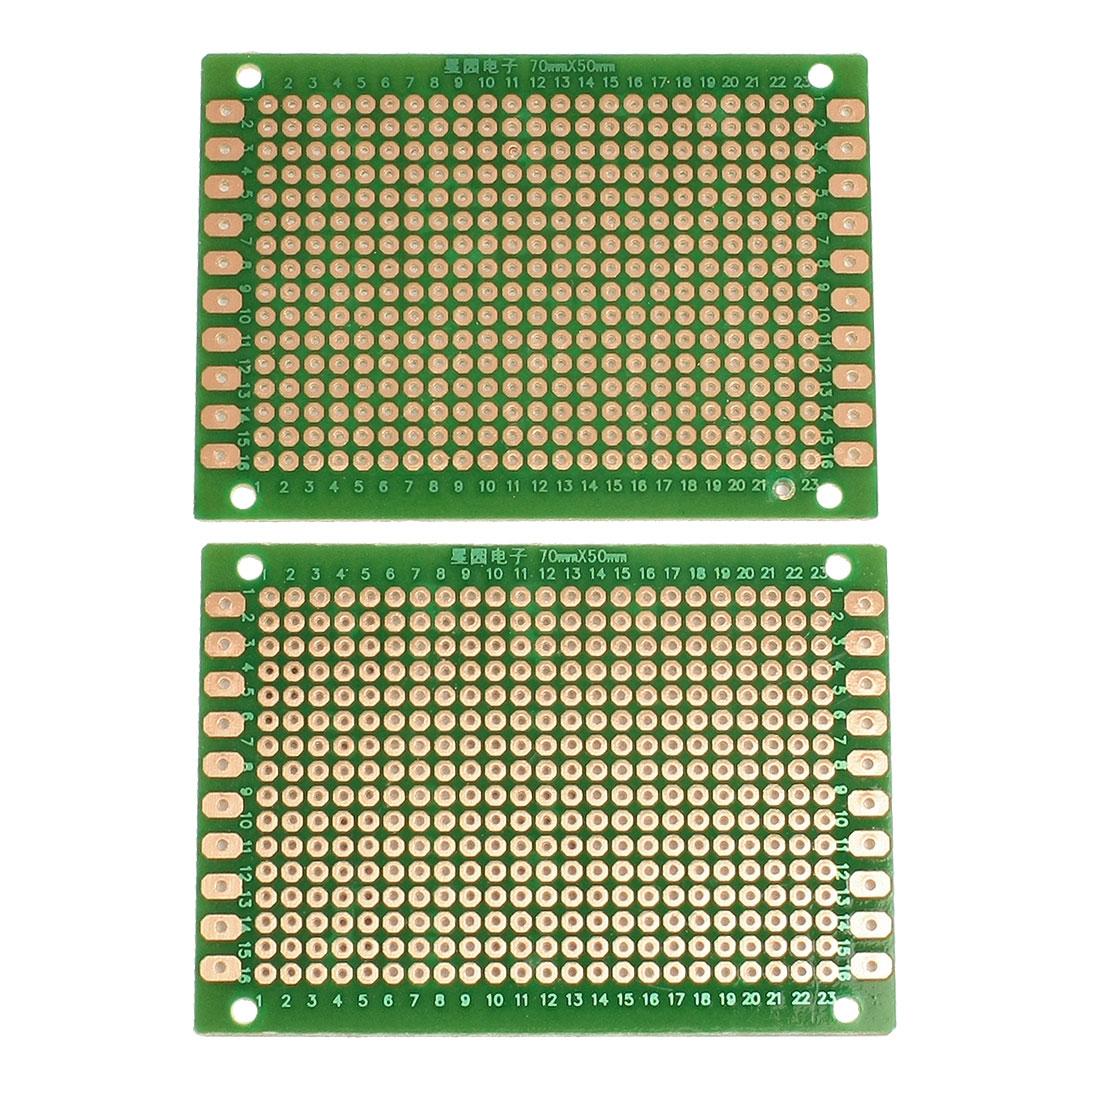 2 Pcs Universal Single Side PCB Board Stripboard 70x50mm Green